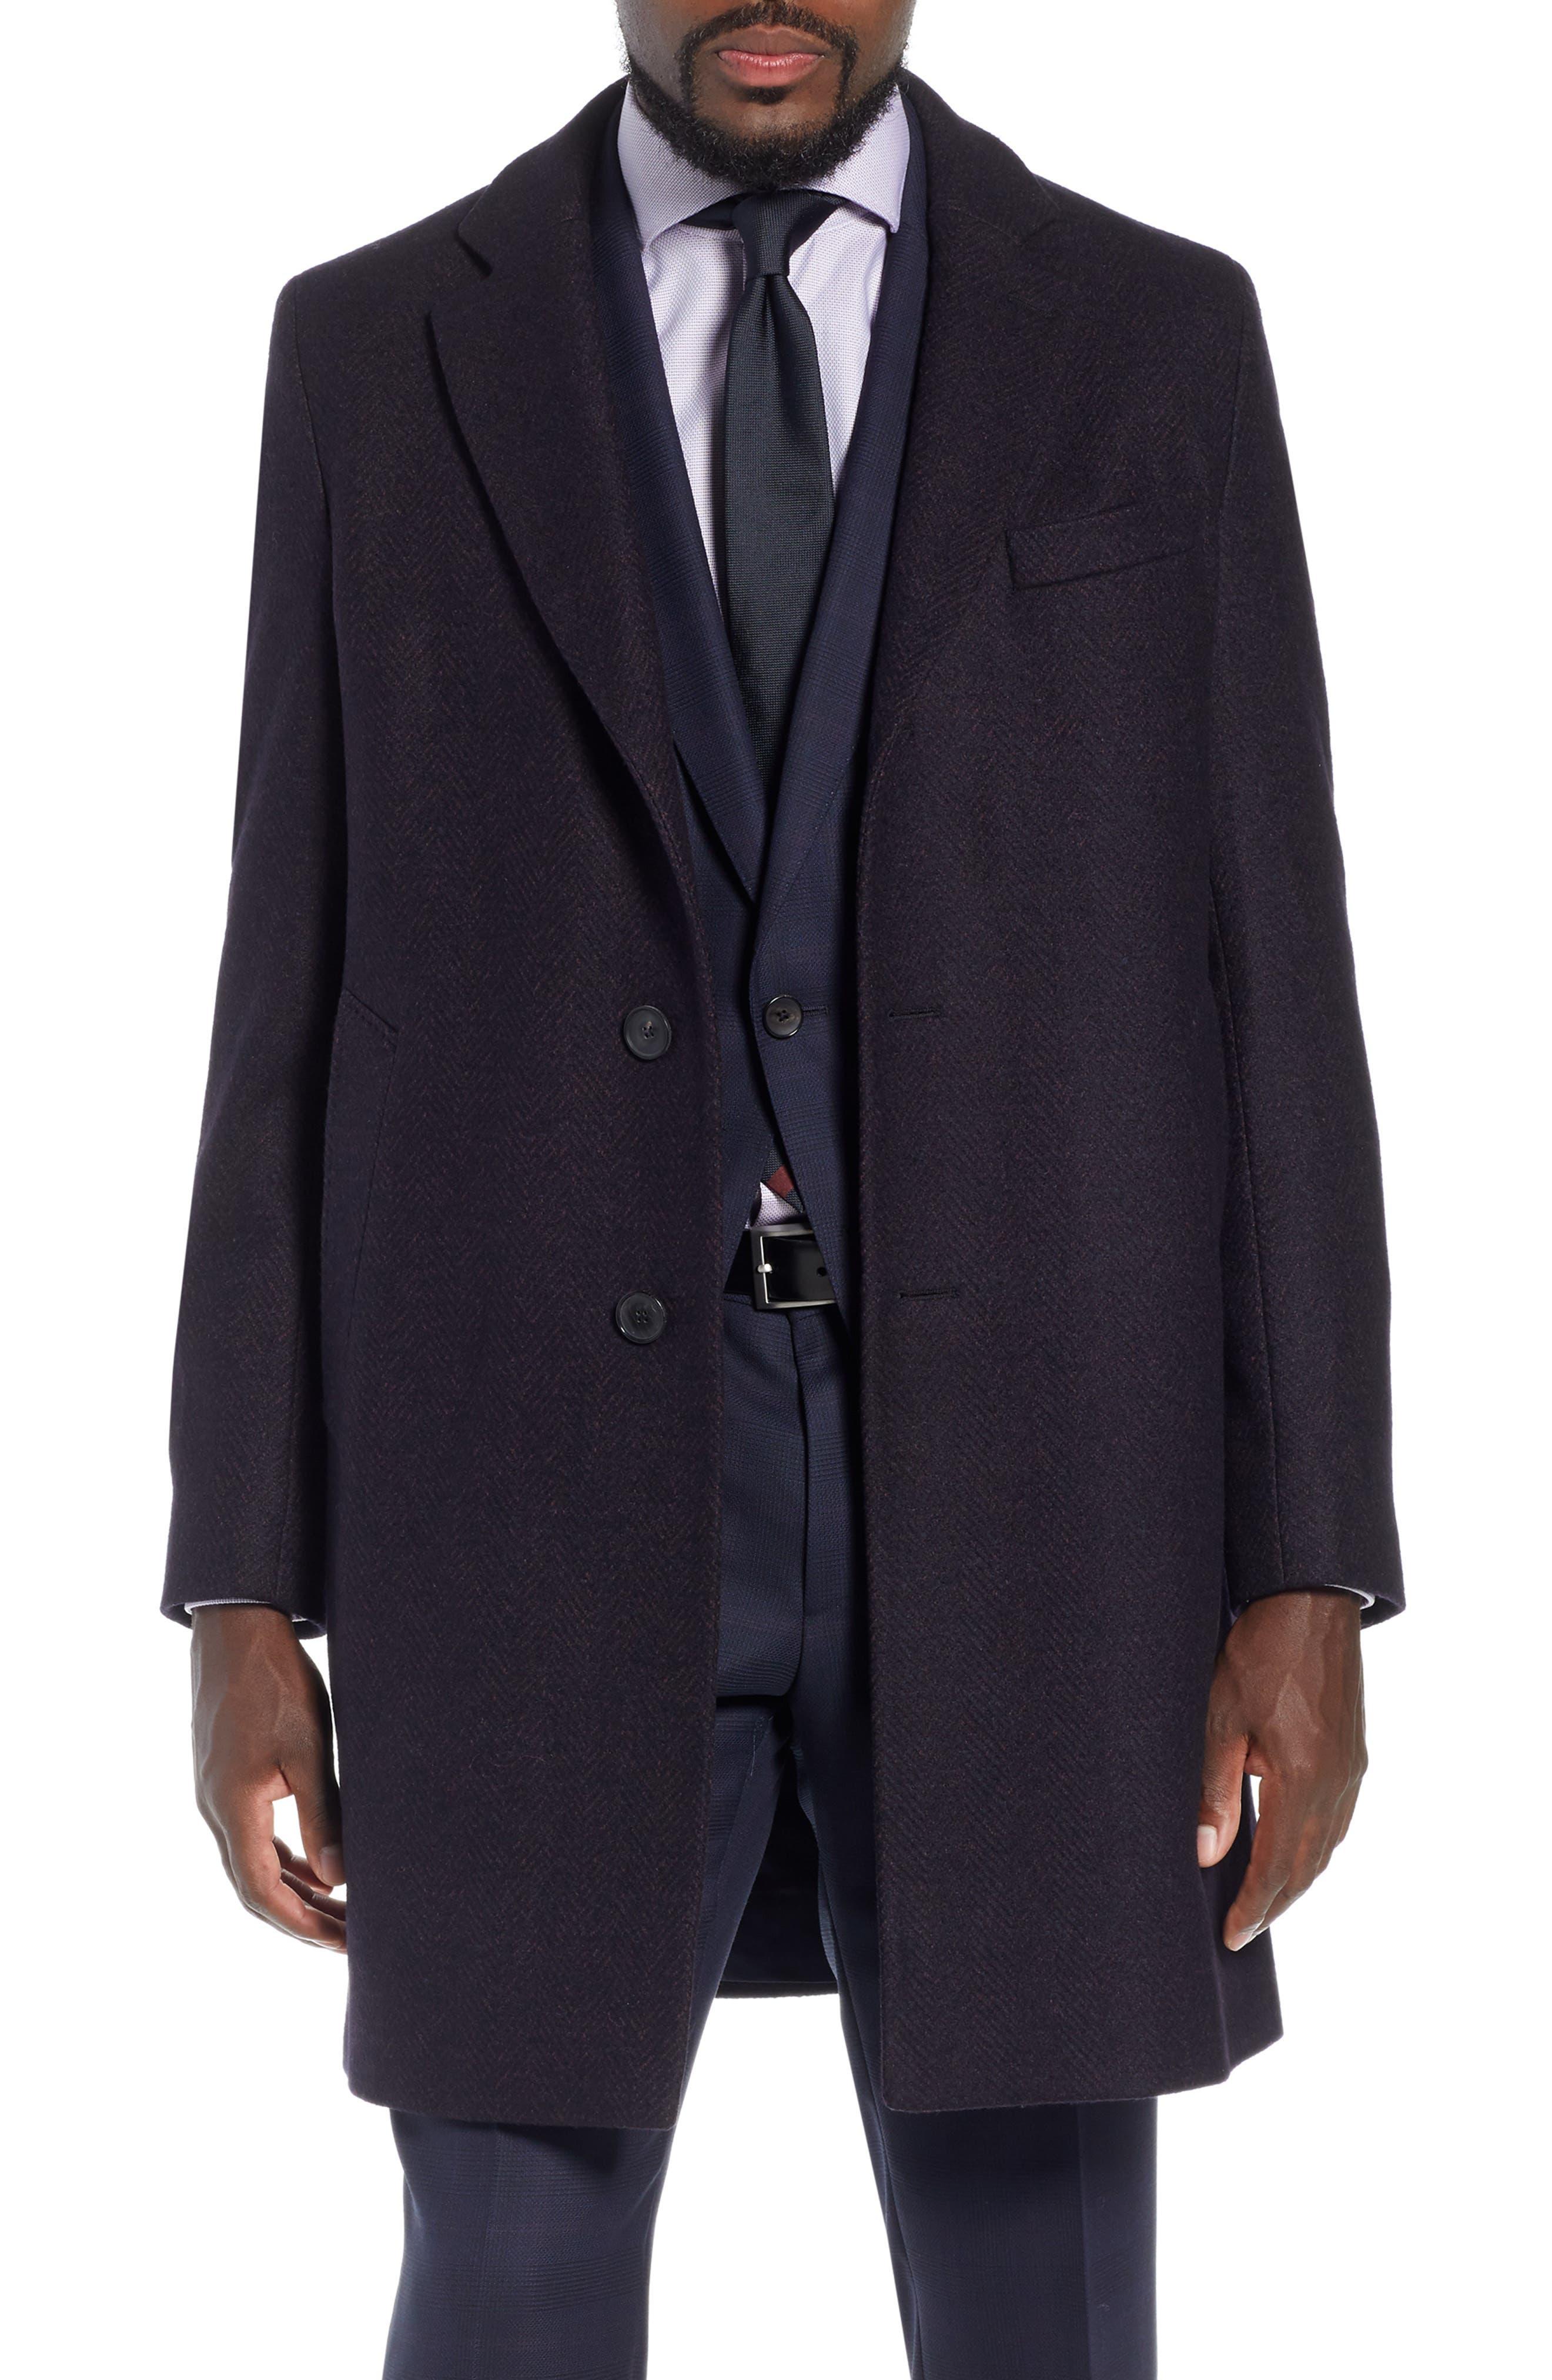 x Nordstrom Nye Wool Blend Top Coat,                             Main thumbnail 1, color,                             DARK RED